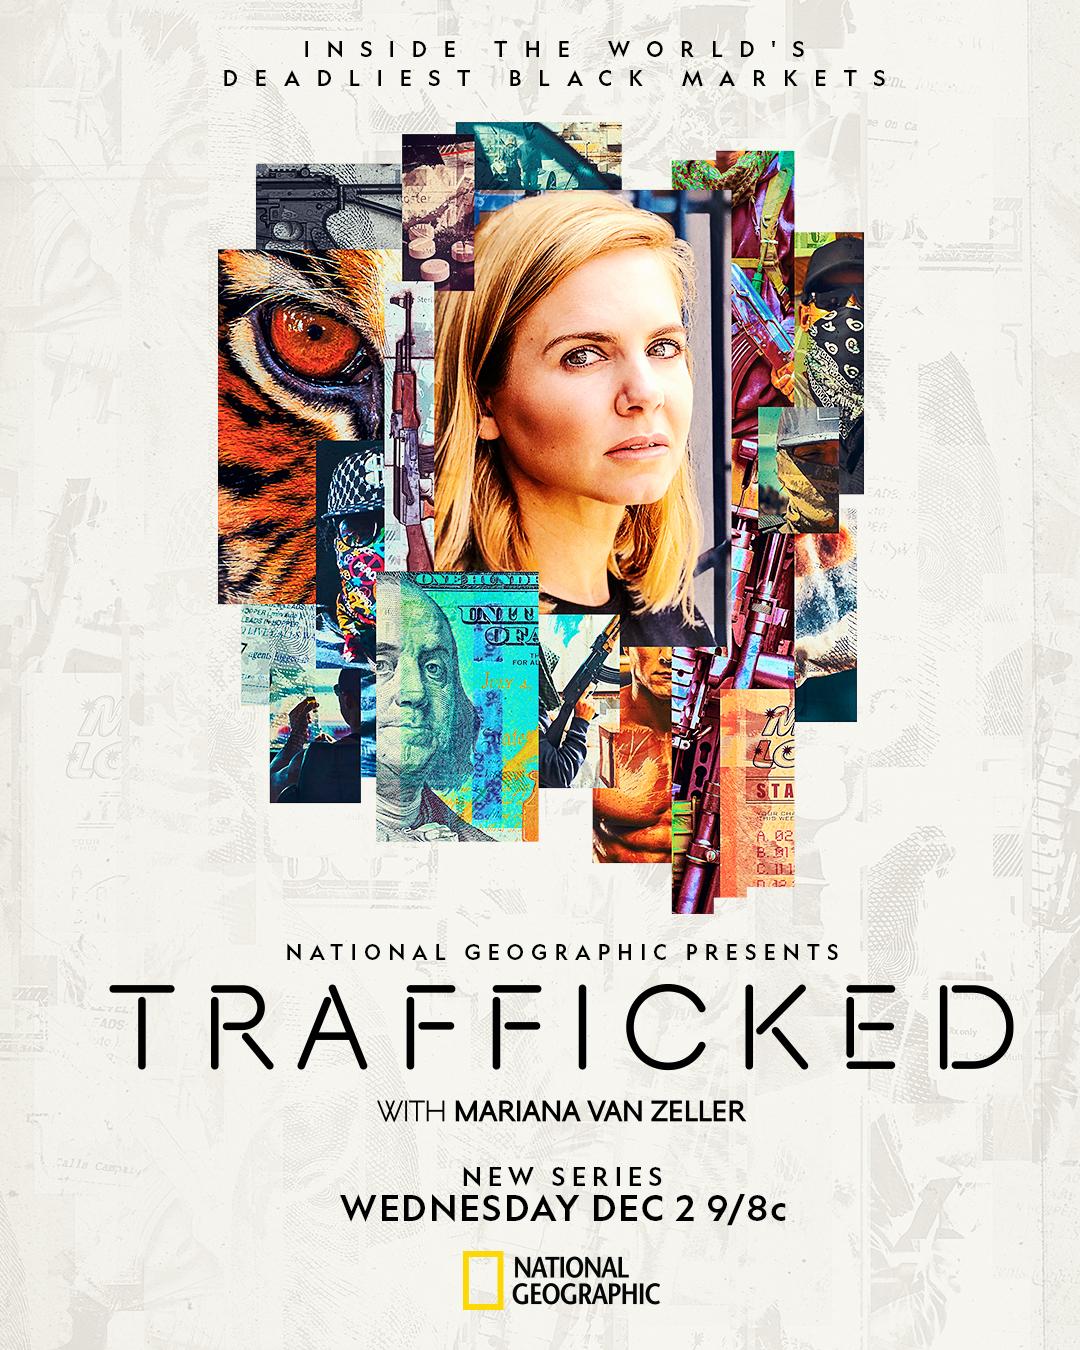 Trafficked.with.Mariana.van.Zeller.S01E00.Mariana.Van.Zeller.Investigates.WEBRip.x264-CAFFEiNE